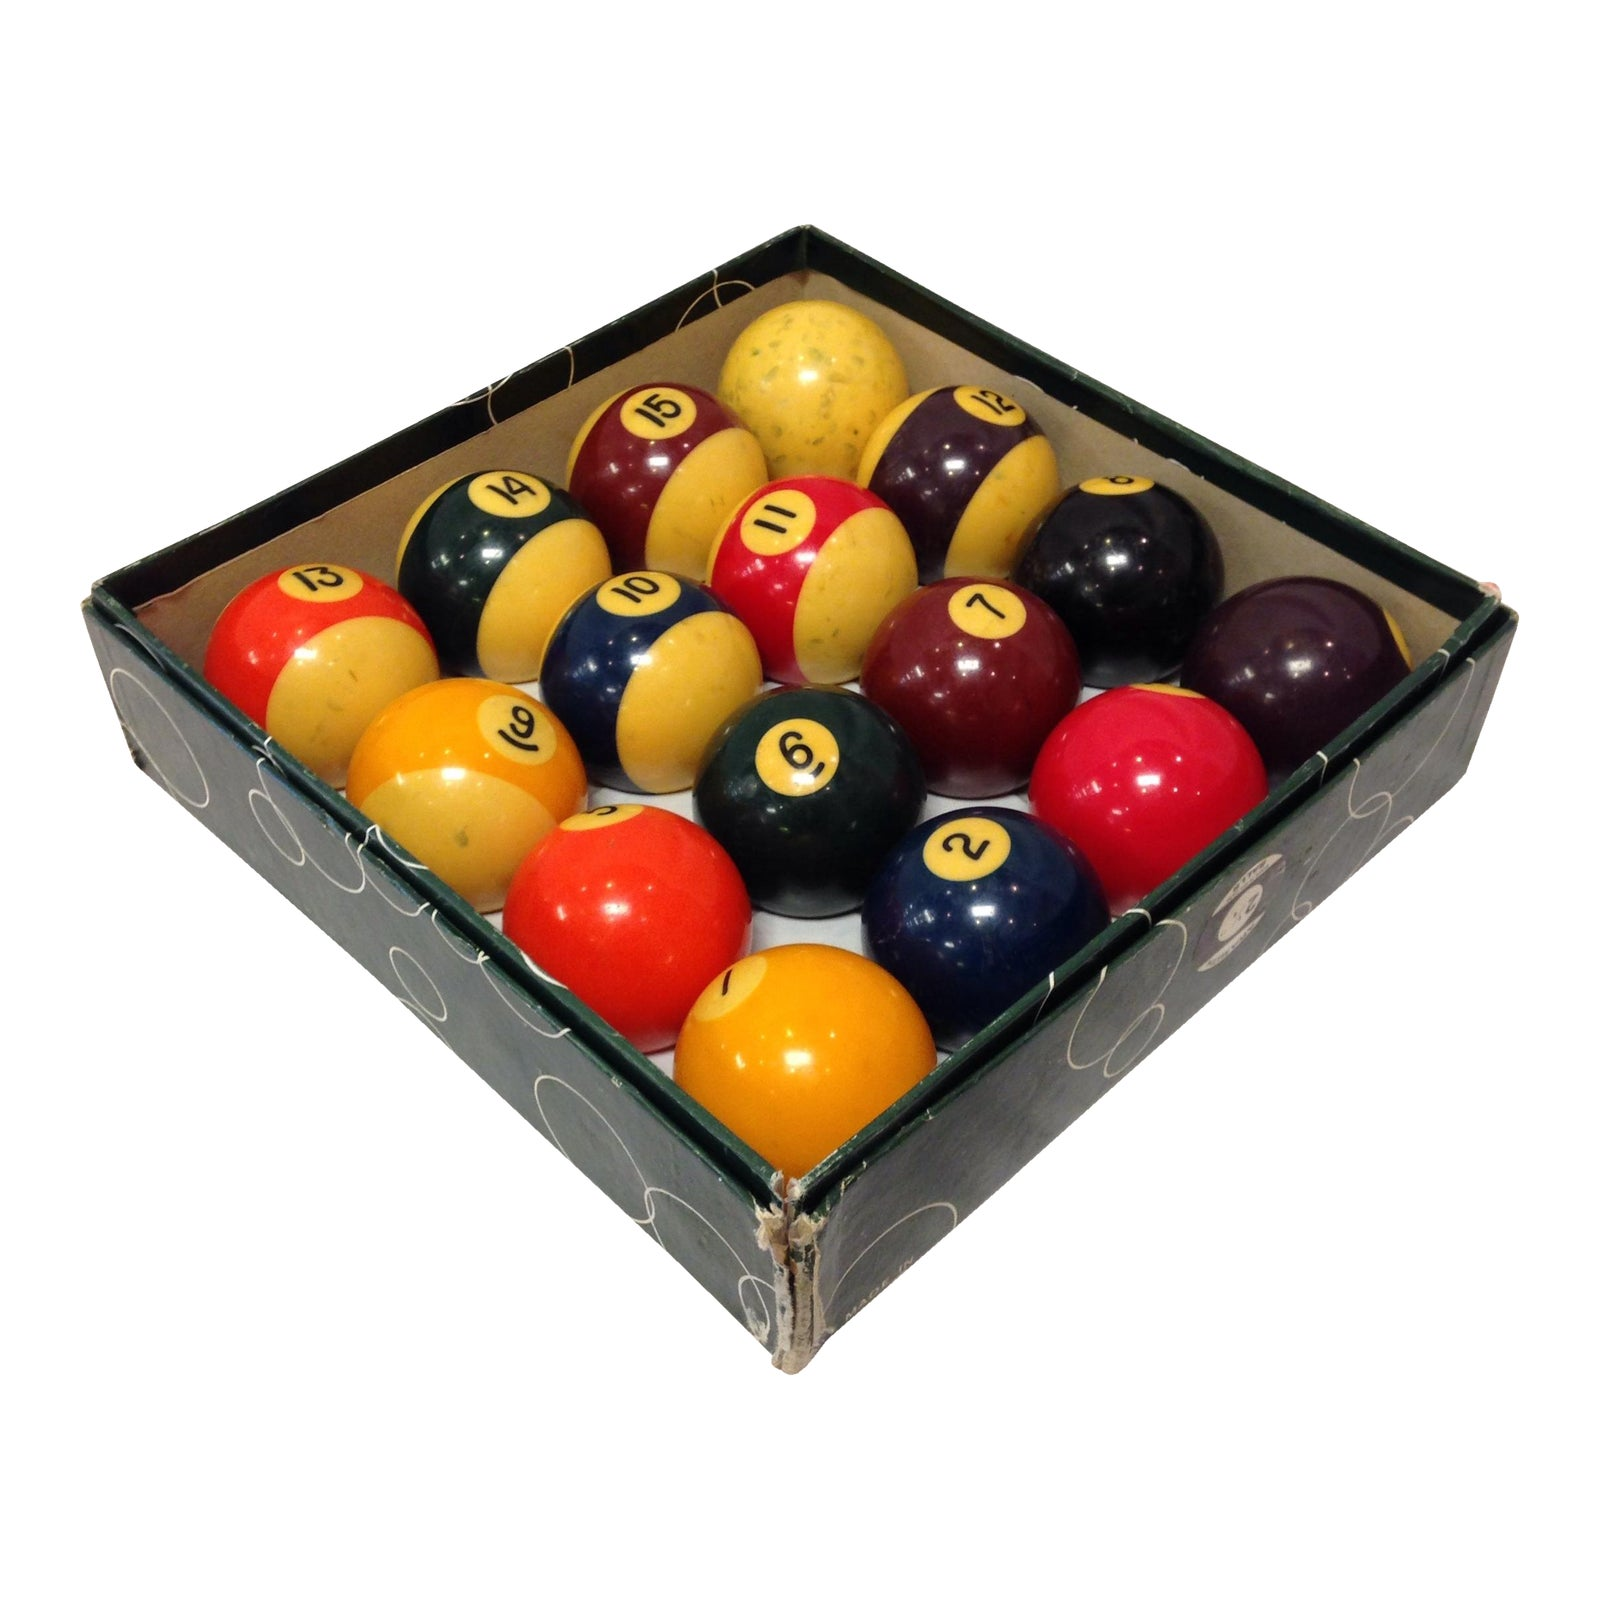 Vintage Belgian Aramith Billiard Pool Balls Chairish